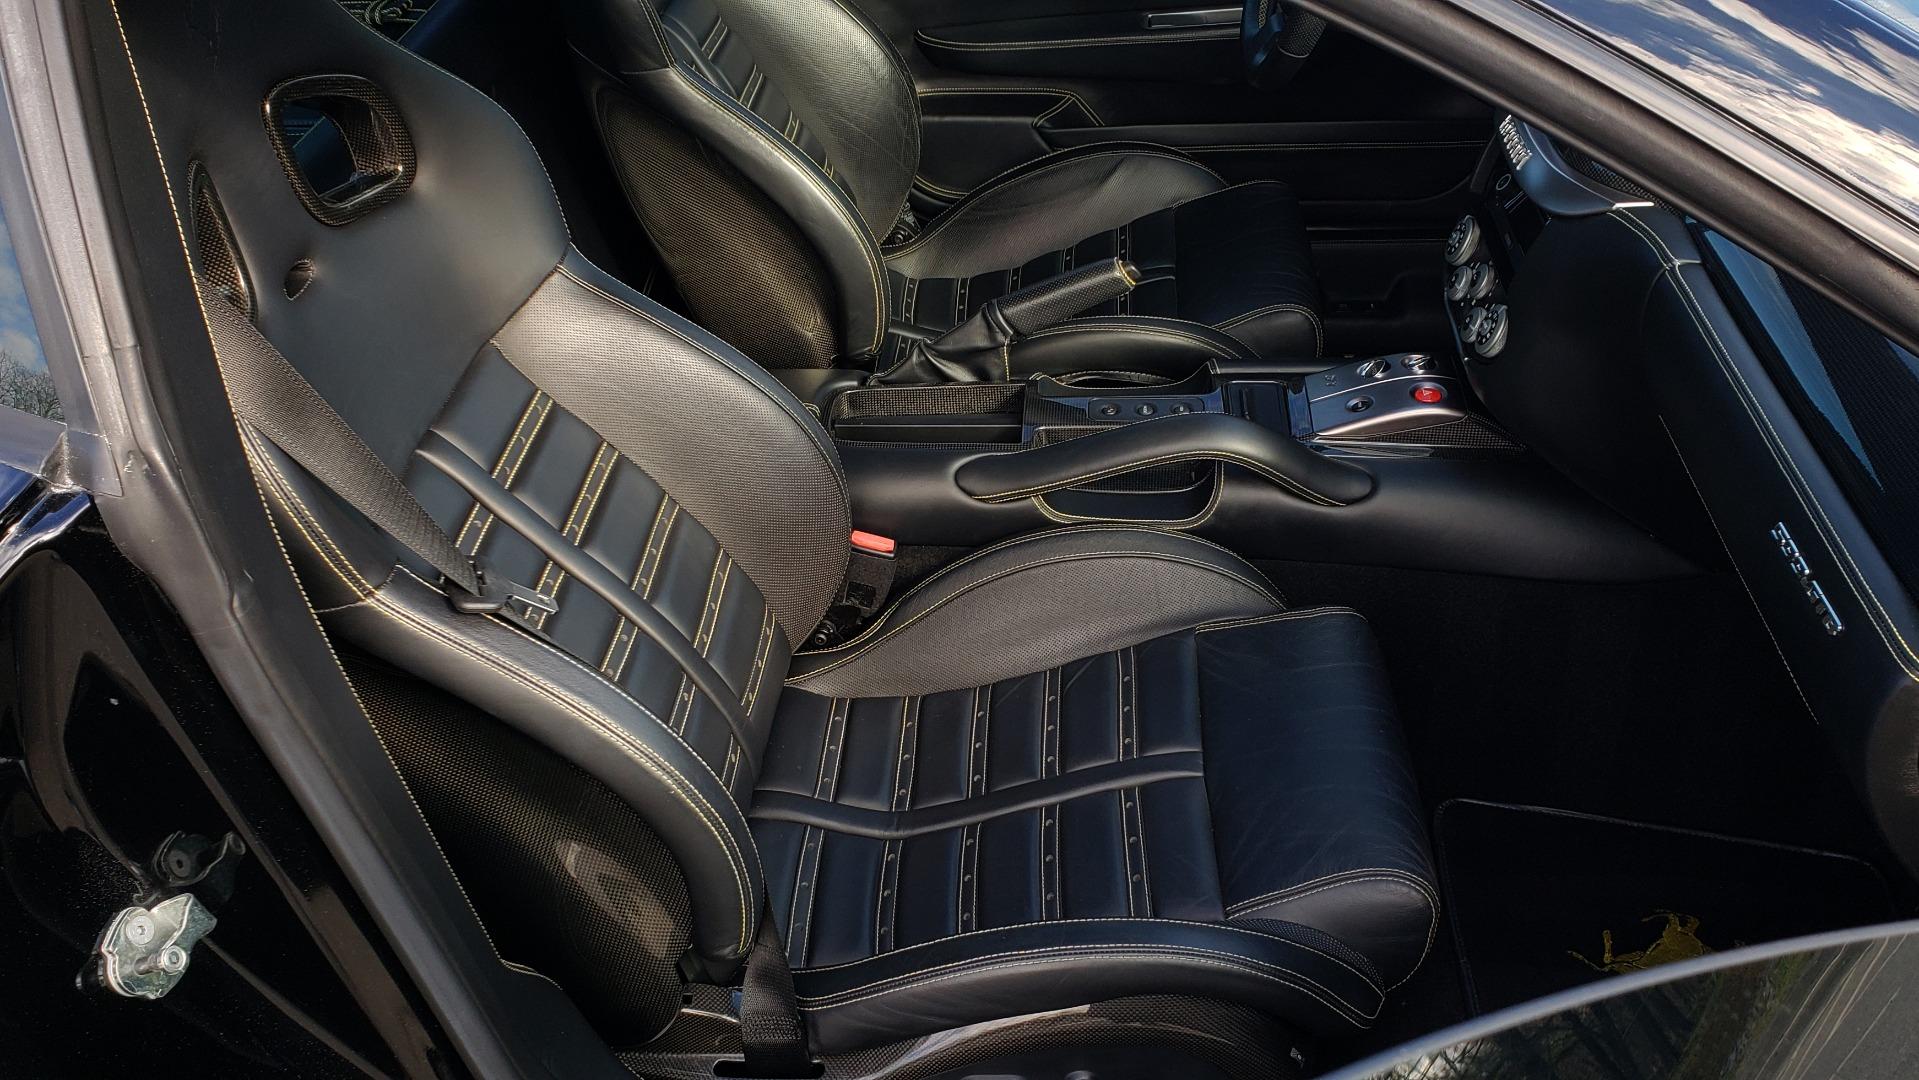 Used 2007 Ferrari 599 GTB FIORANO HGTE / V12 / F1 TRANS / NAV / BOSE / CUSTOM WHEELS for sale $109,999 at Formula Imports in Charlotte NC 28227 97